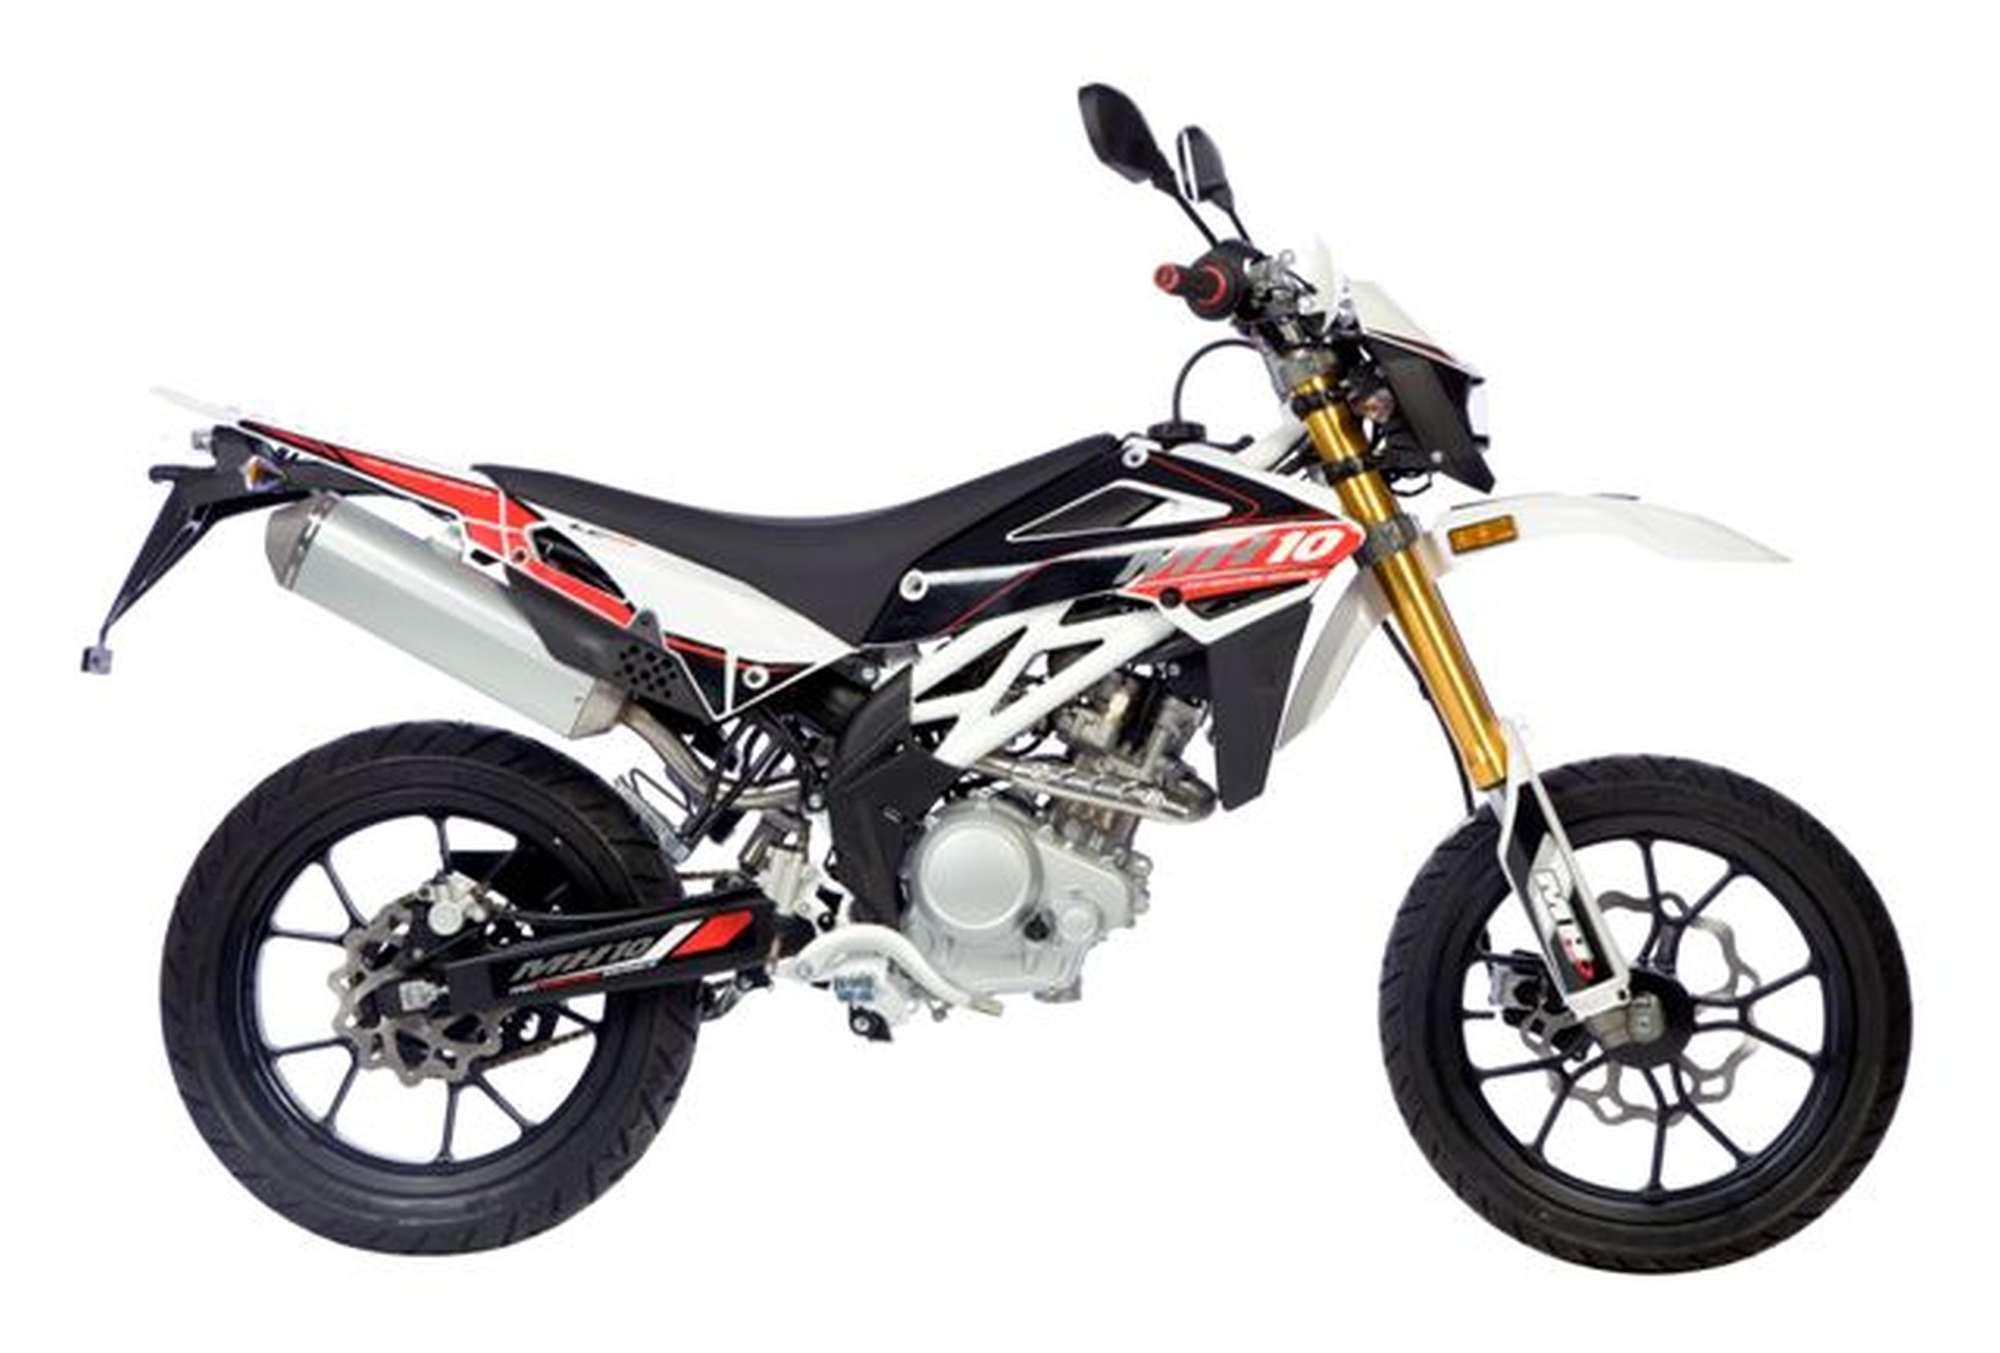 MH Motorcycles varaosat